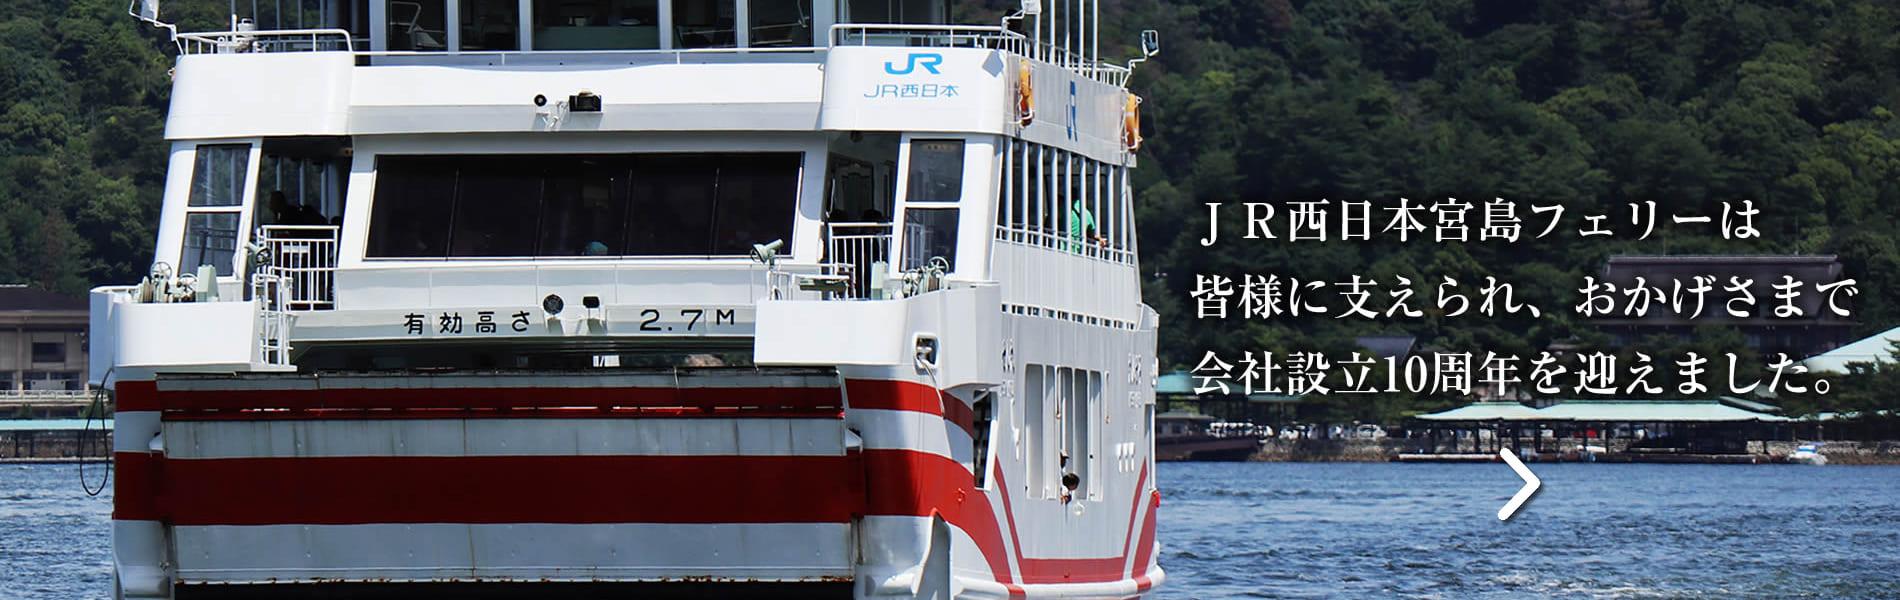 JR西日本宮島フェリー会社設立10周年